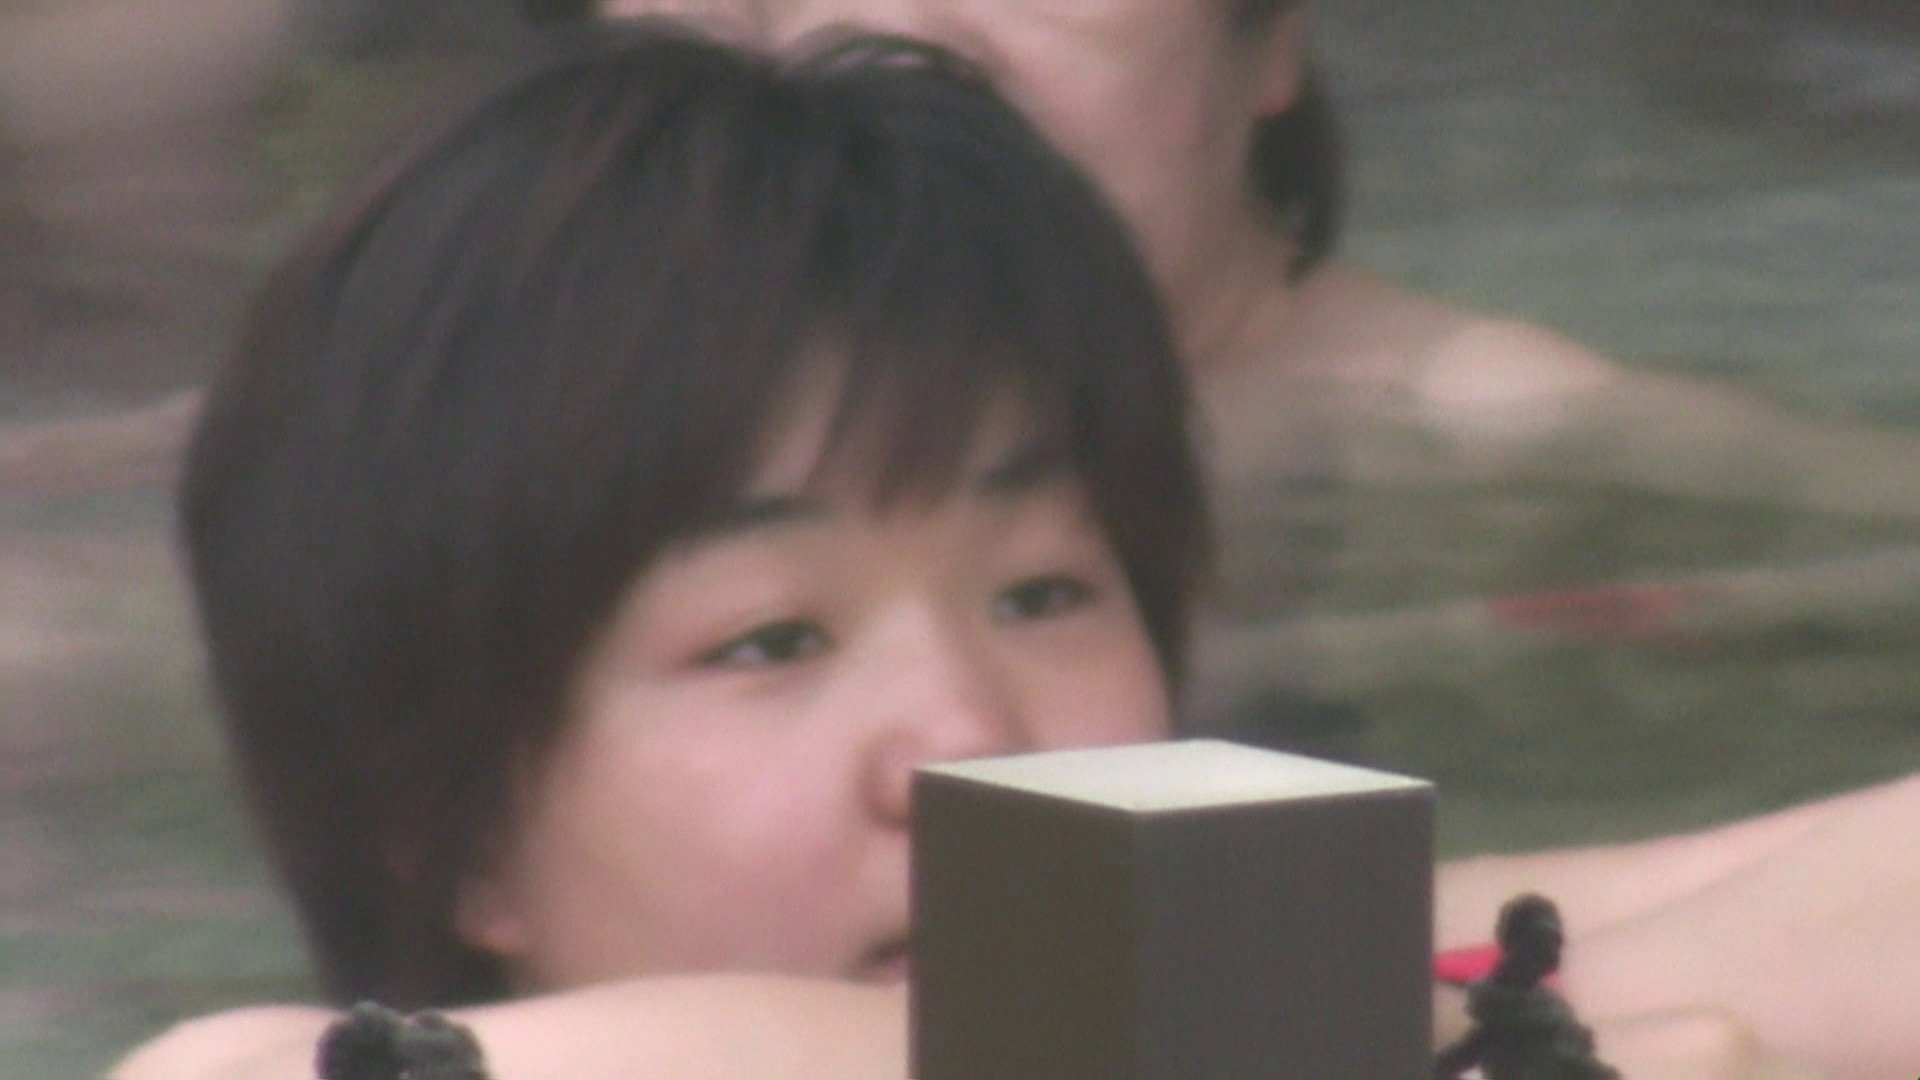 Aquaな露天風呂Vol.53【VIP限定】 女体盗撮  93連発 36